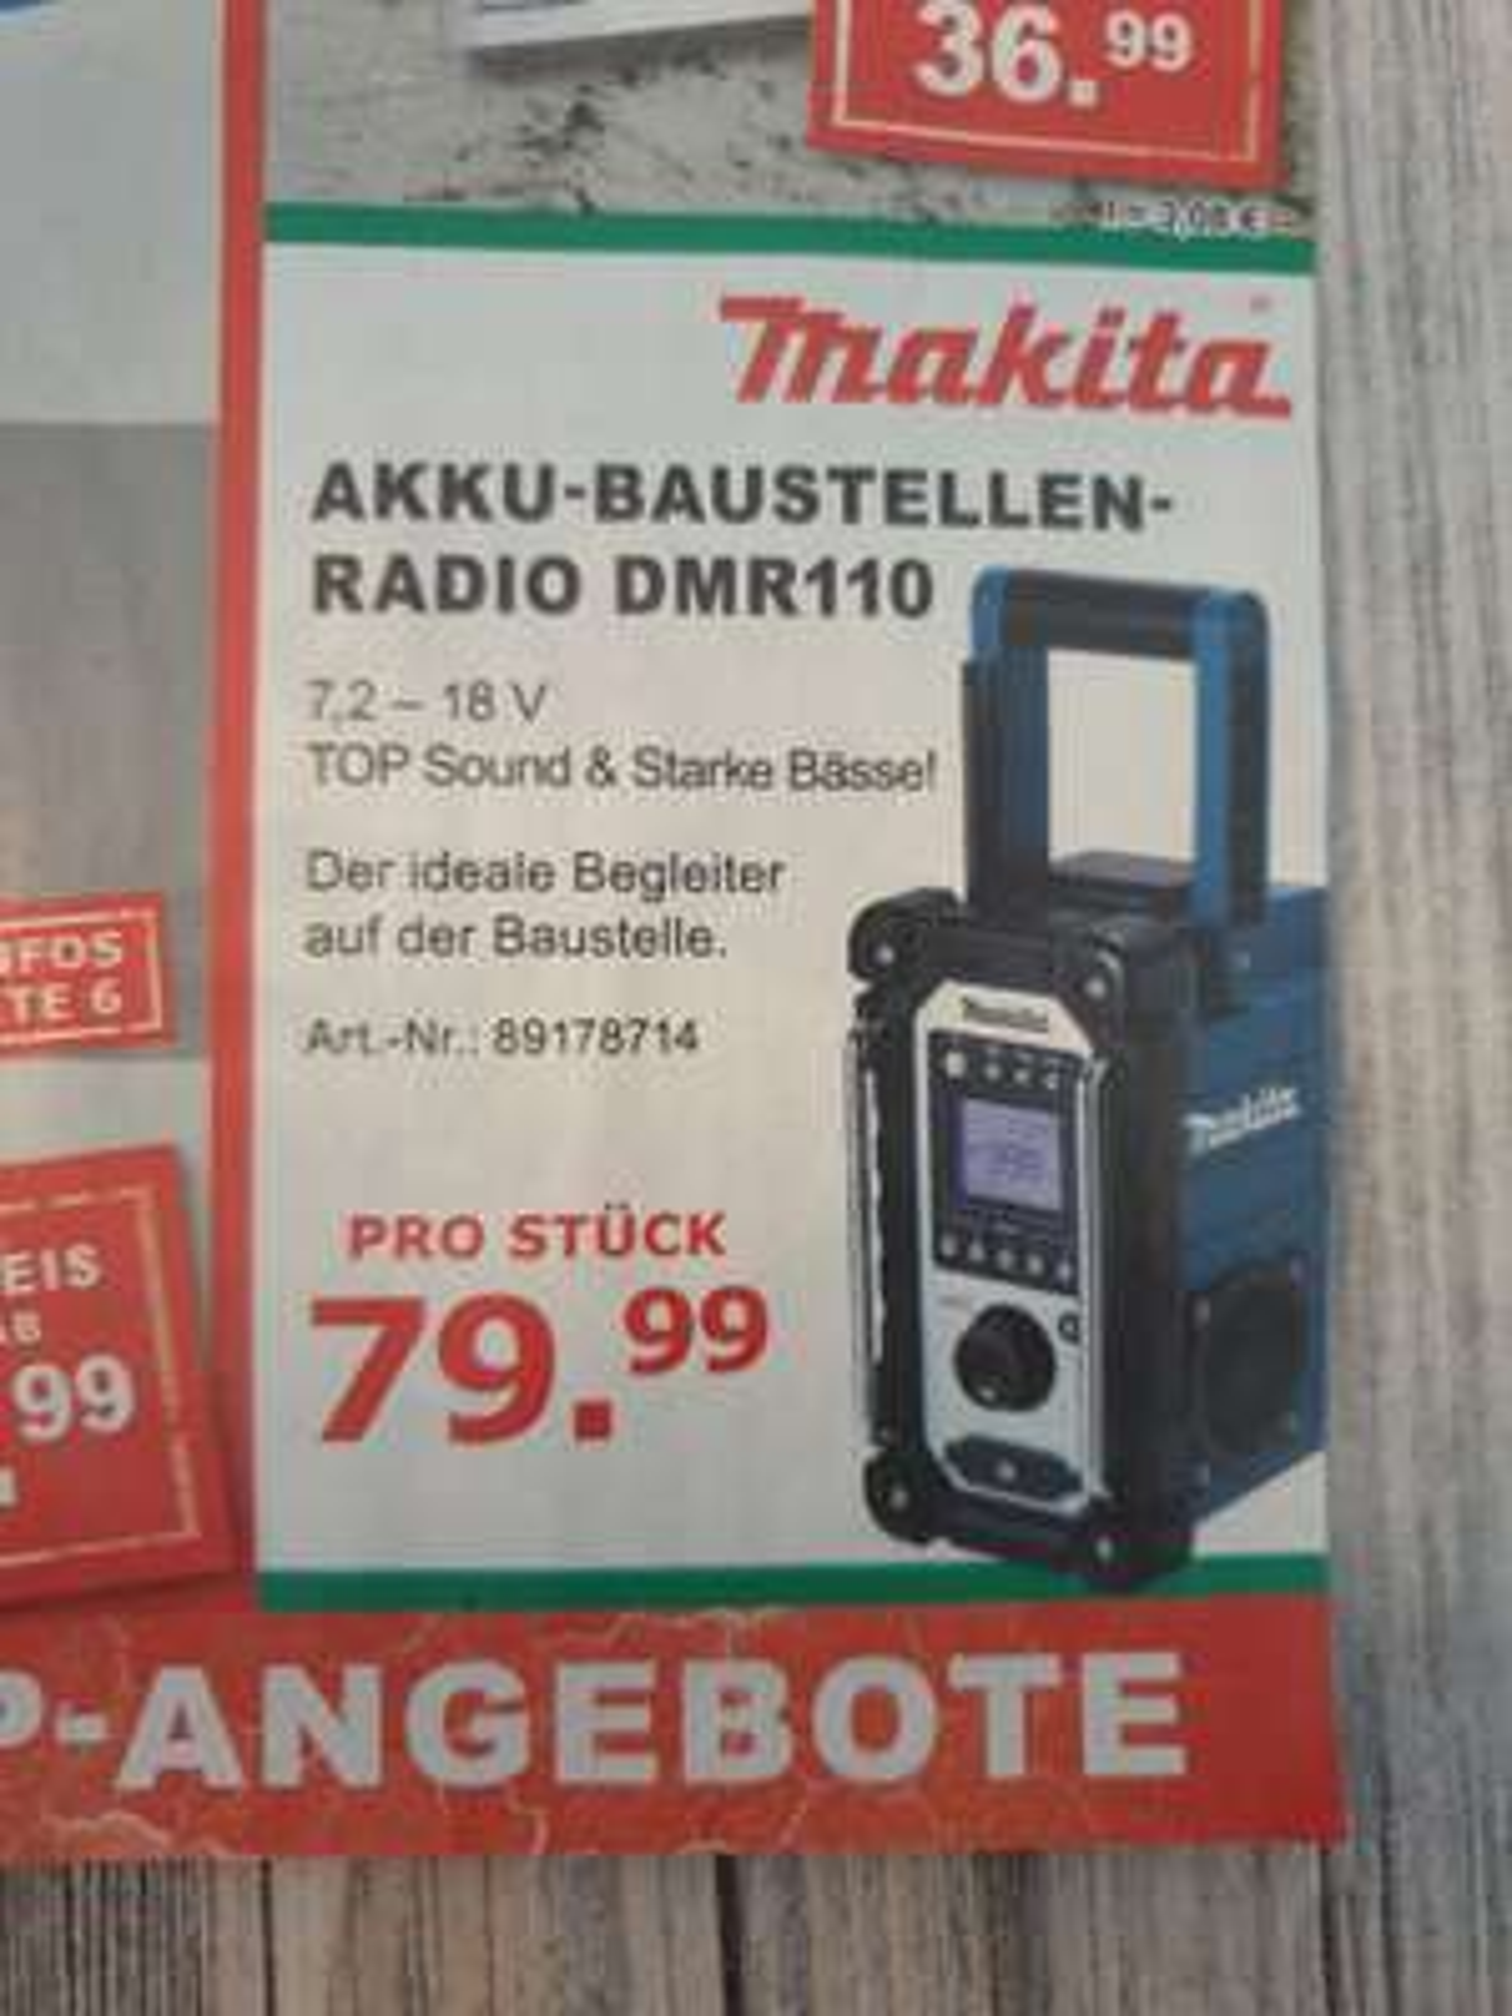 Makita Baustellenradio DMR110 DAB+ (Bauhaus TPG) Fassbender Tenten Bonn Düsseldorf Köln u.a.